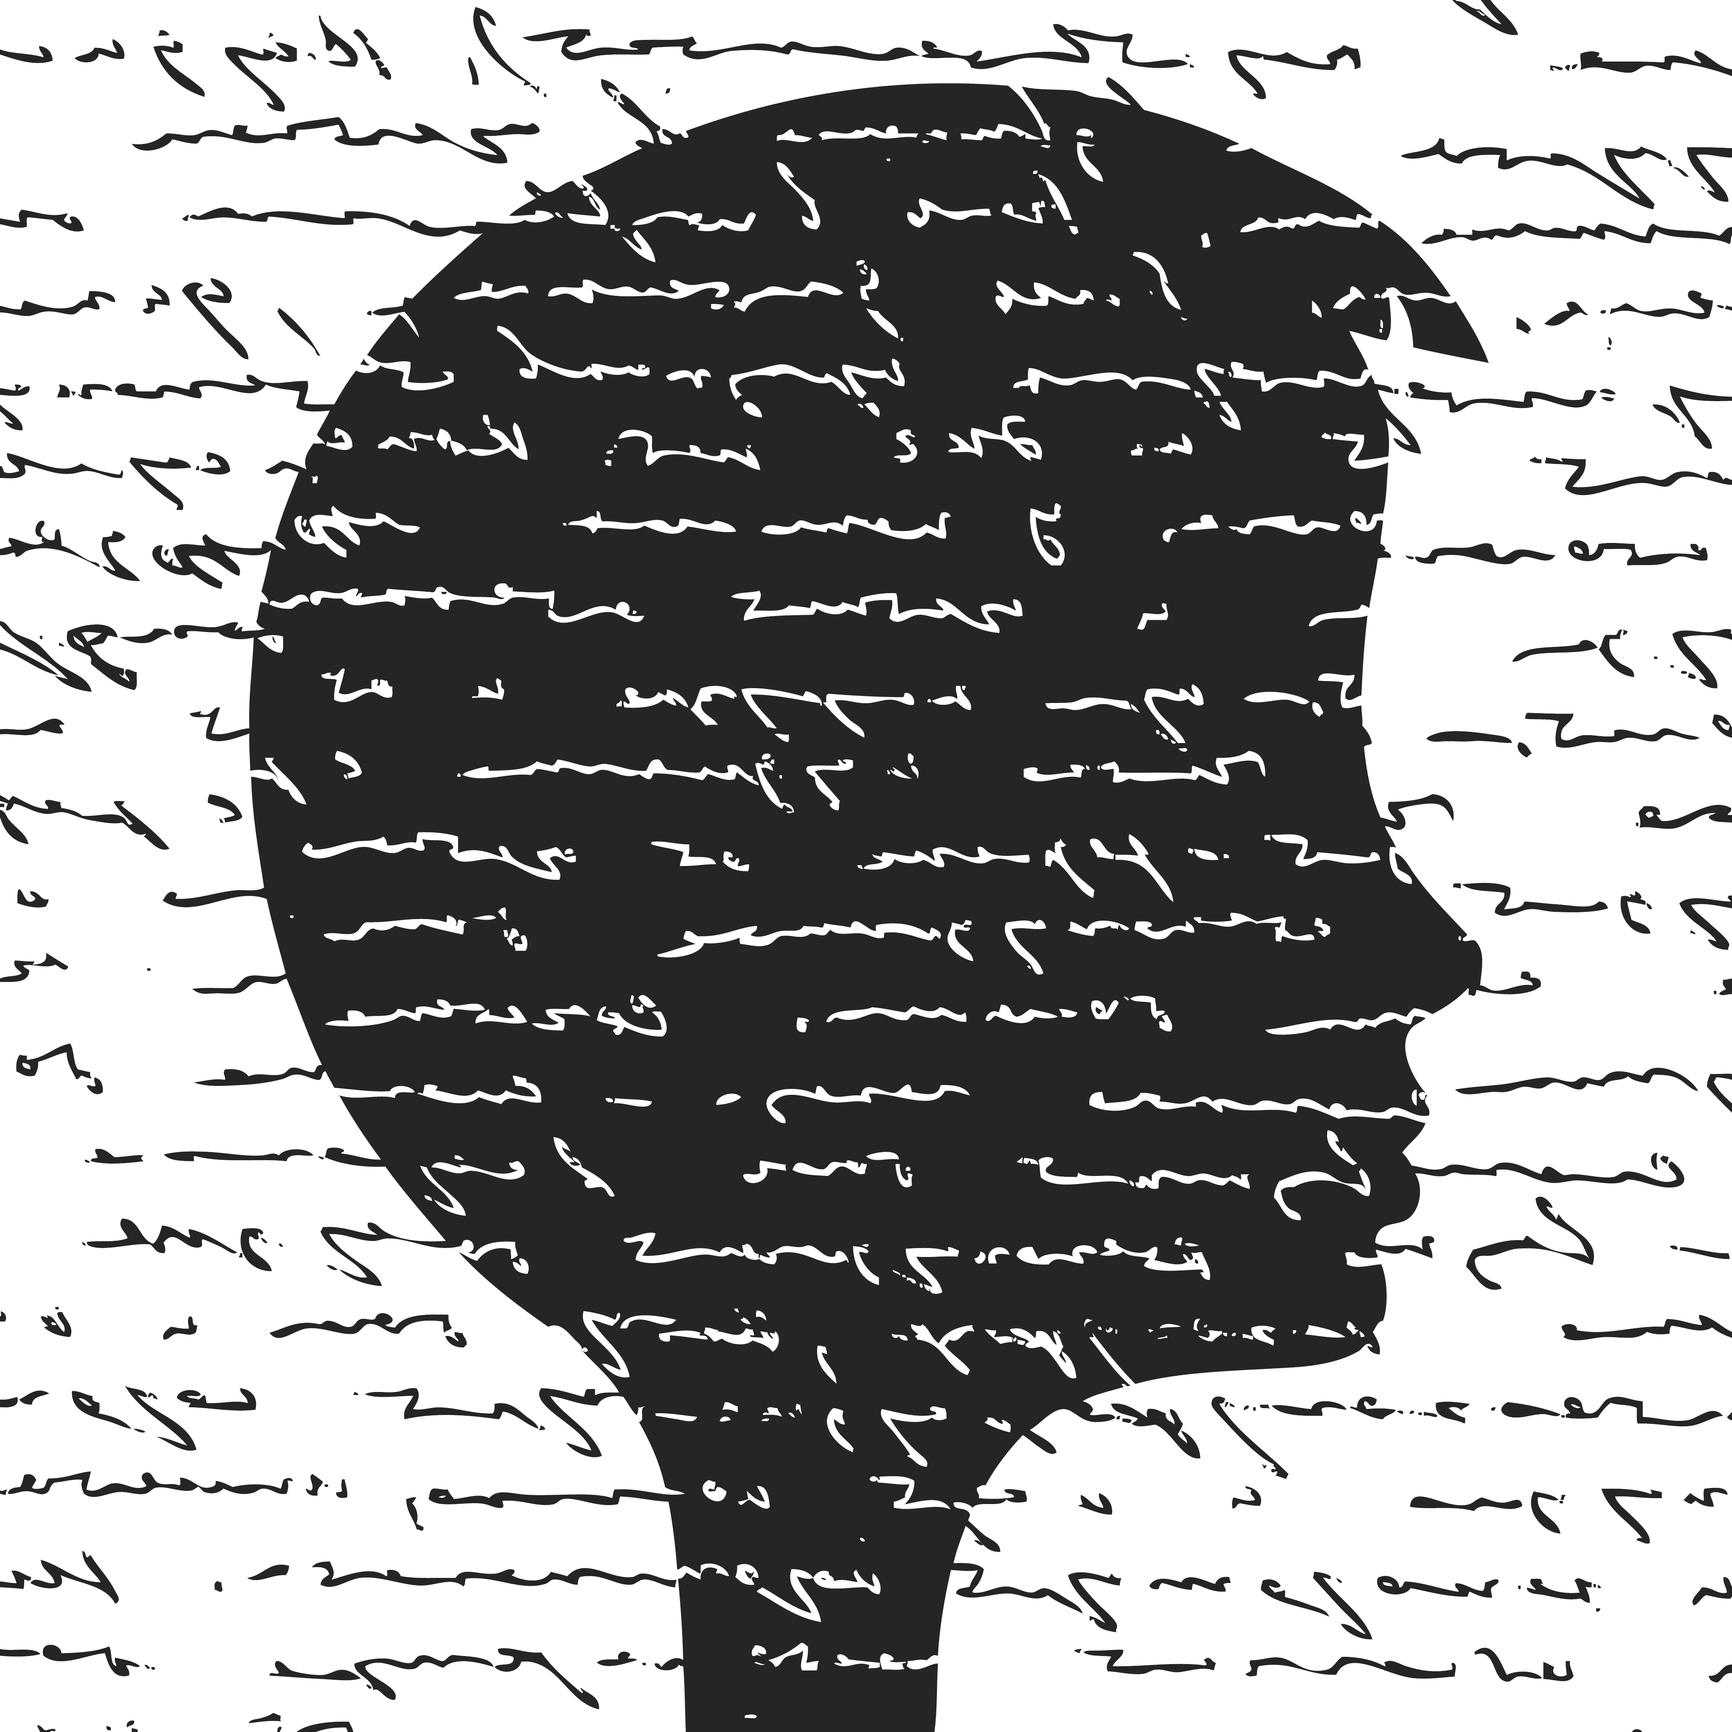 thinking about writing